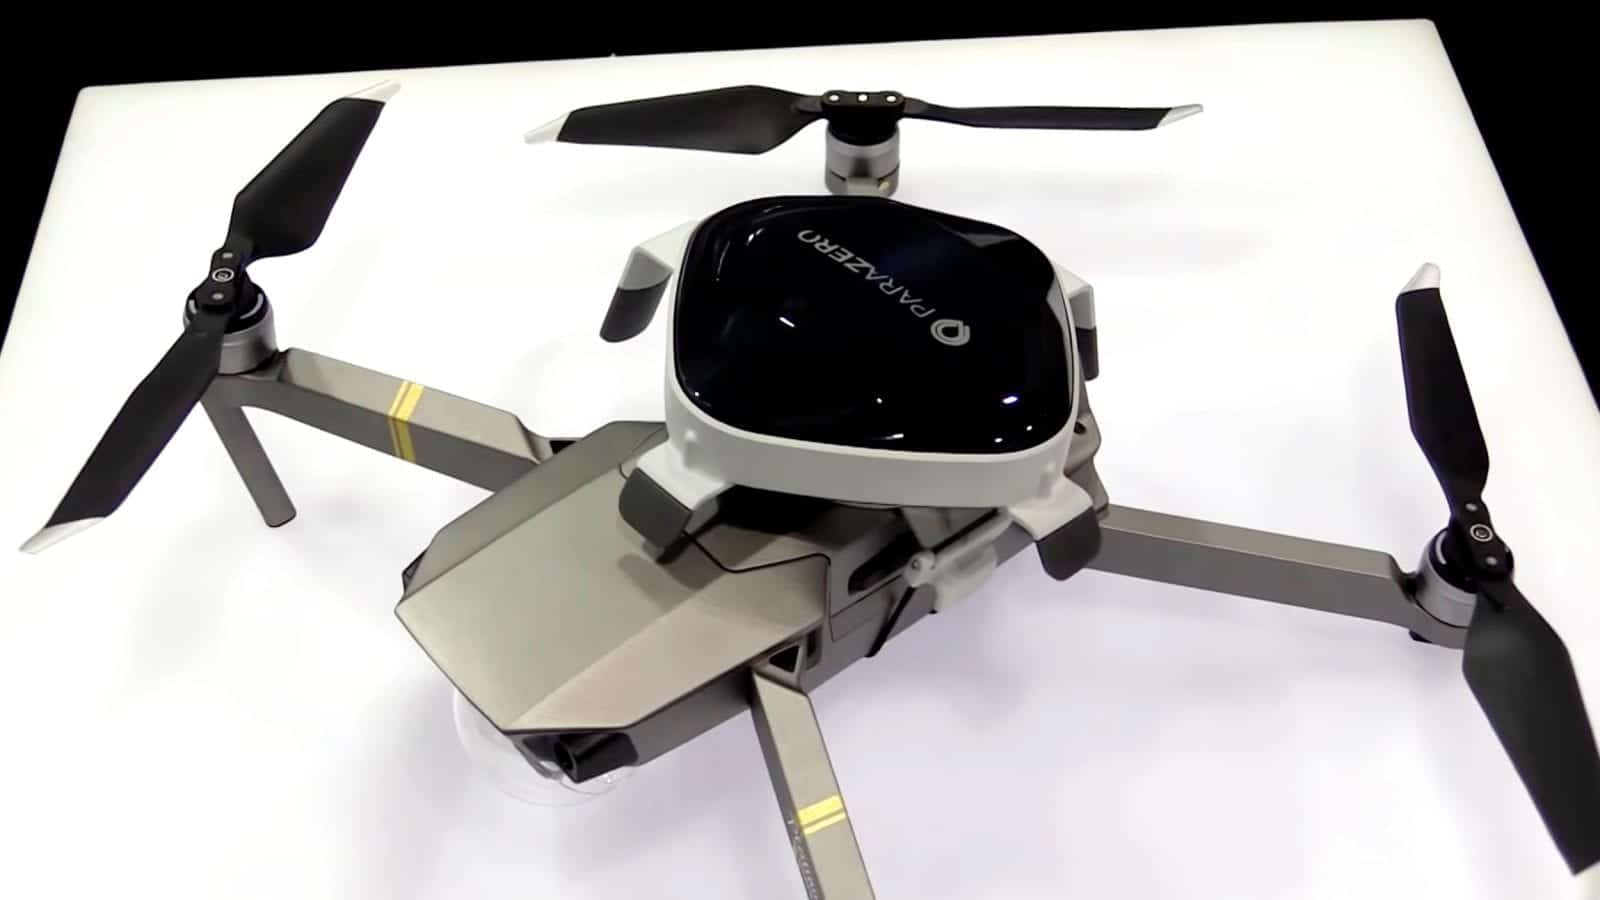 ParaZero SafeAir drone parachute system